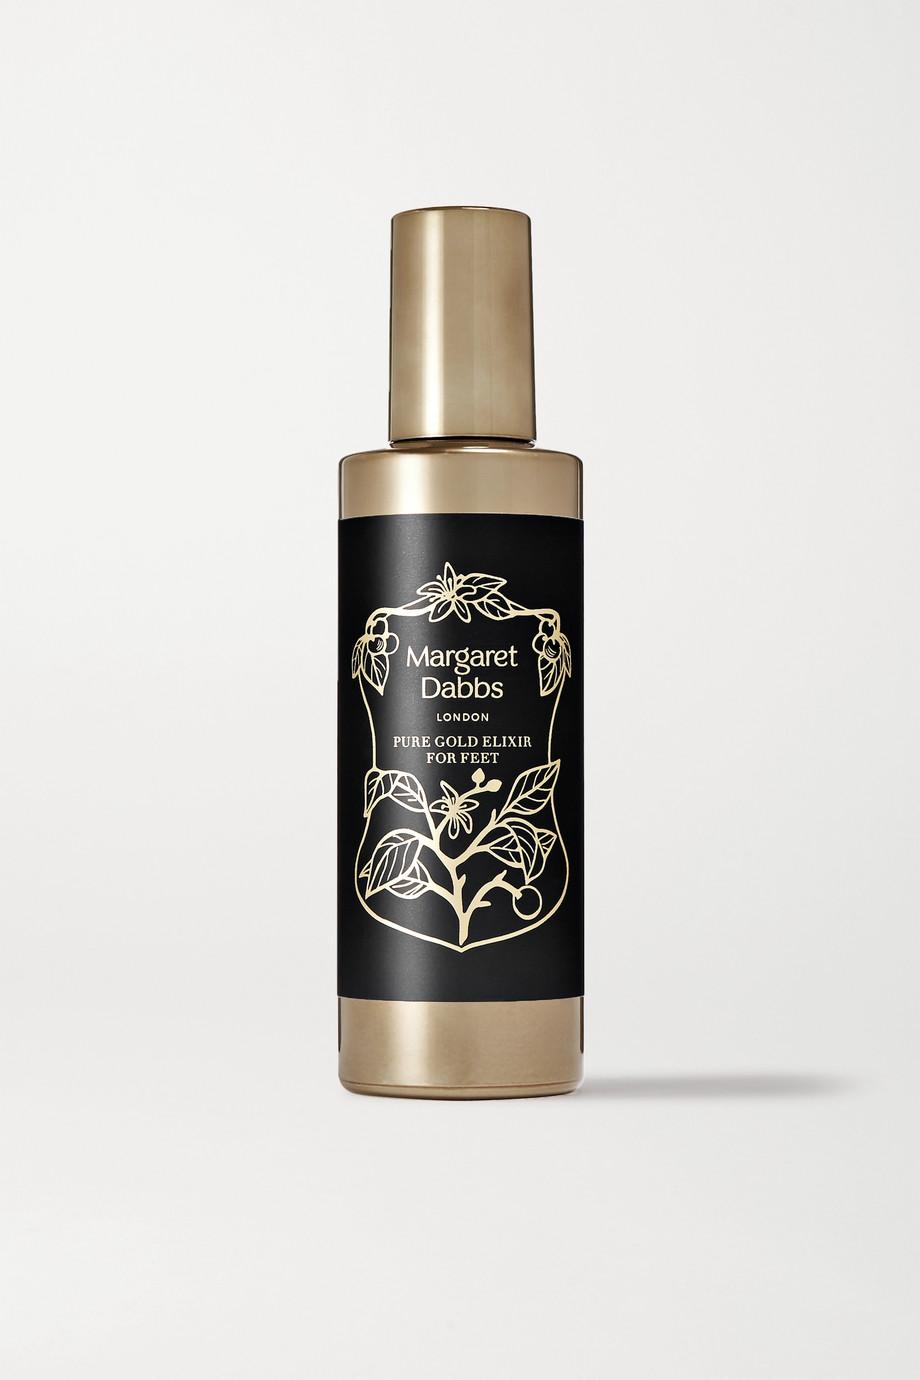 Margaret Dabbs London Pure Gold Elixir, 200ml